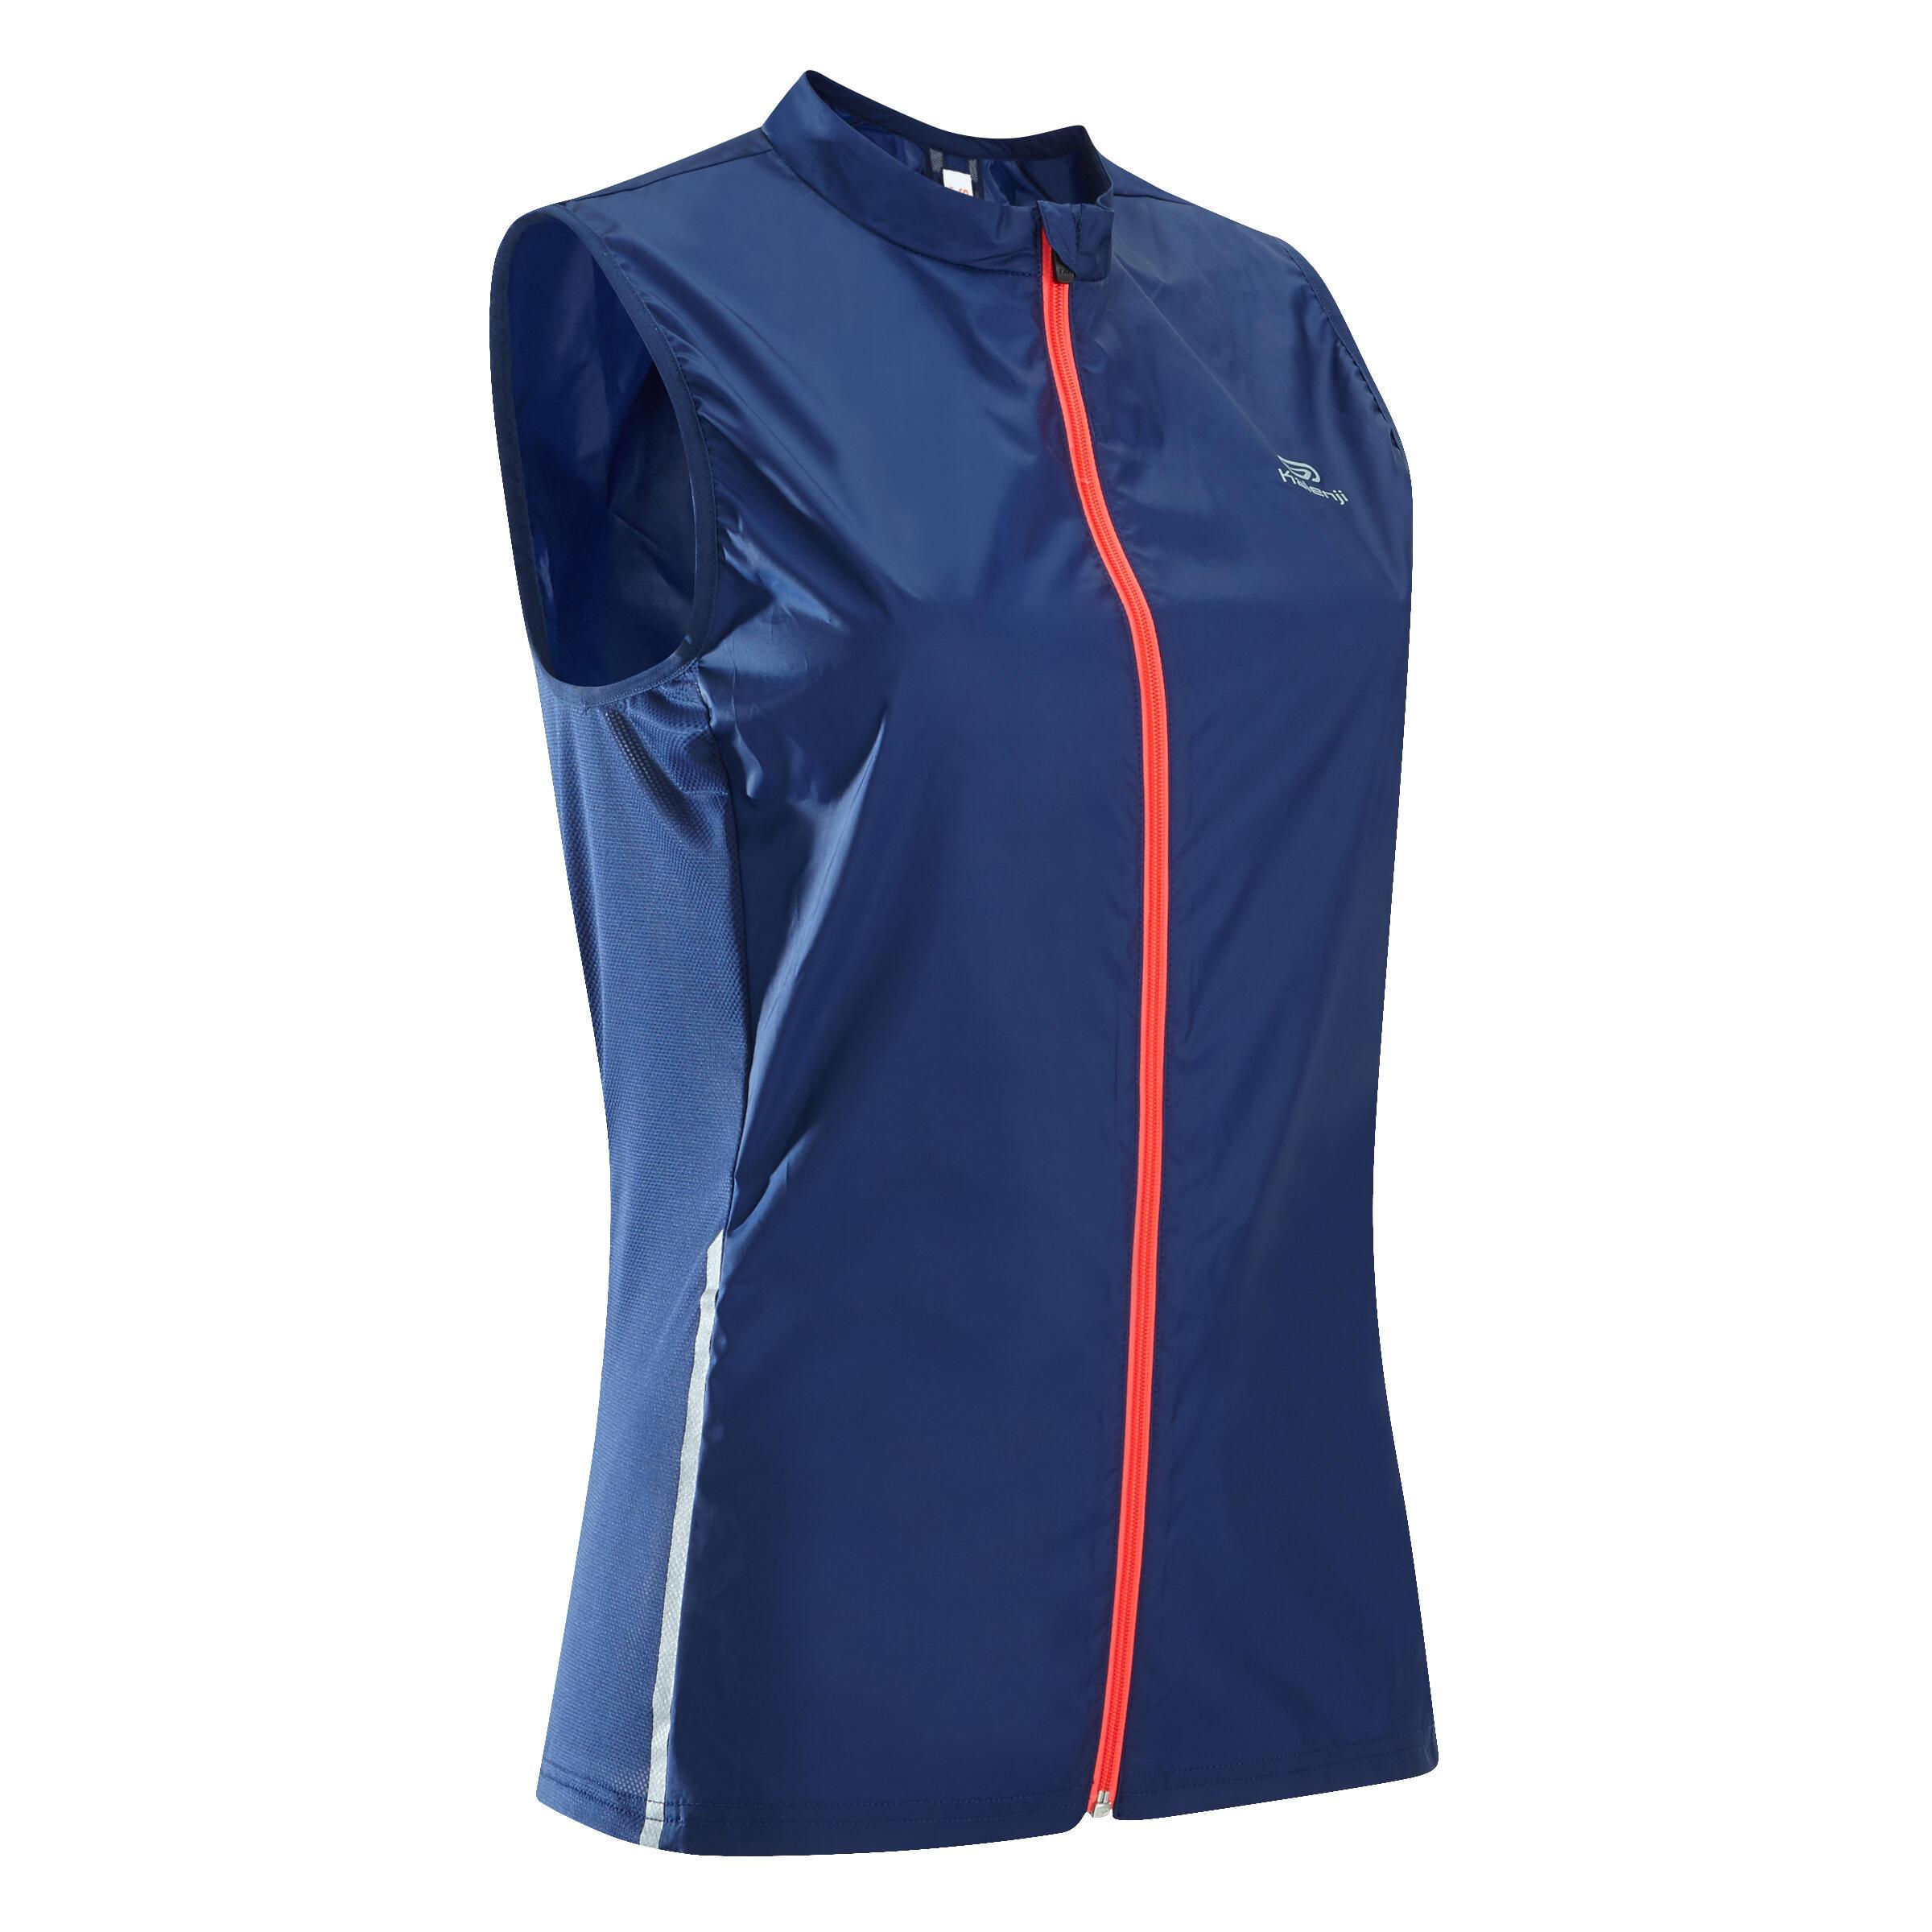 Kalenji Mouwloos windjack jogging dames Run Wind